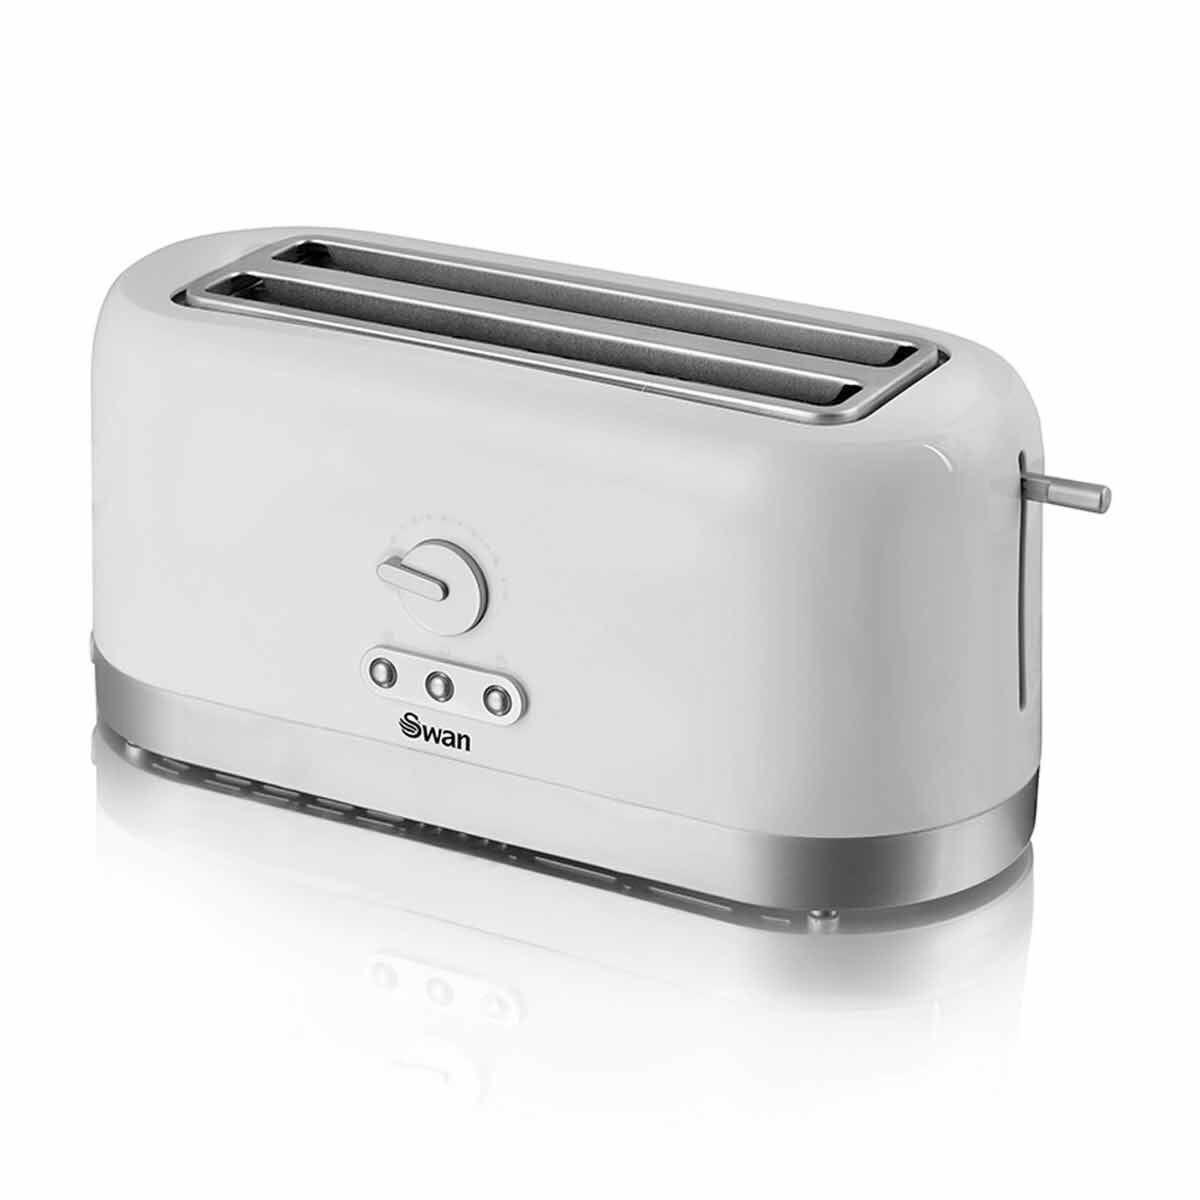 Swan Long Slot 4 Slice Toaster 1400W